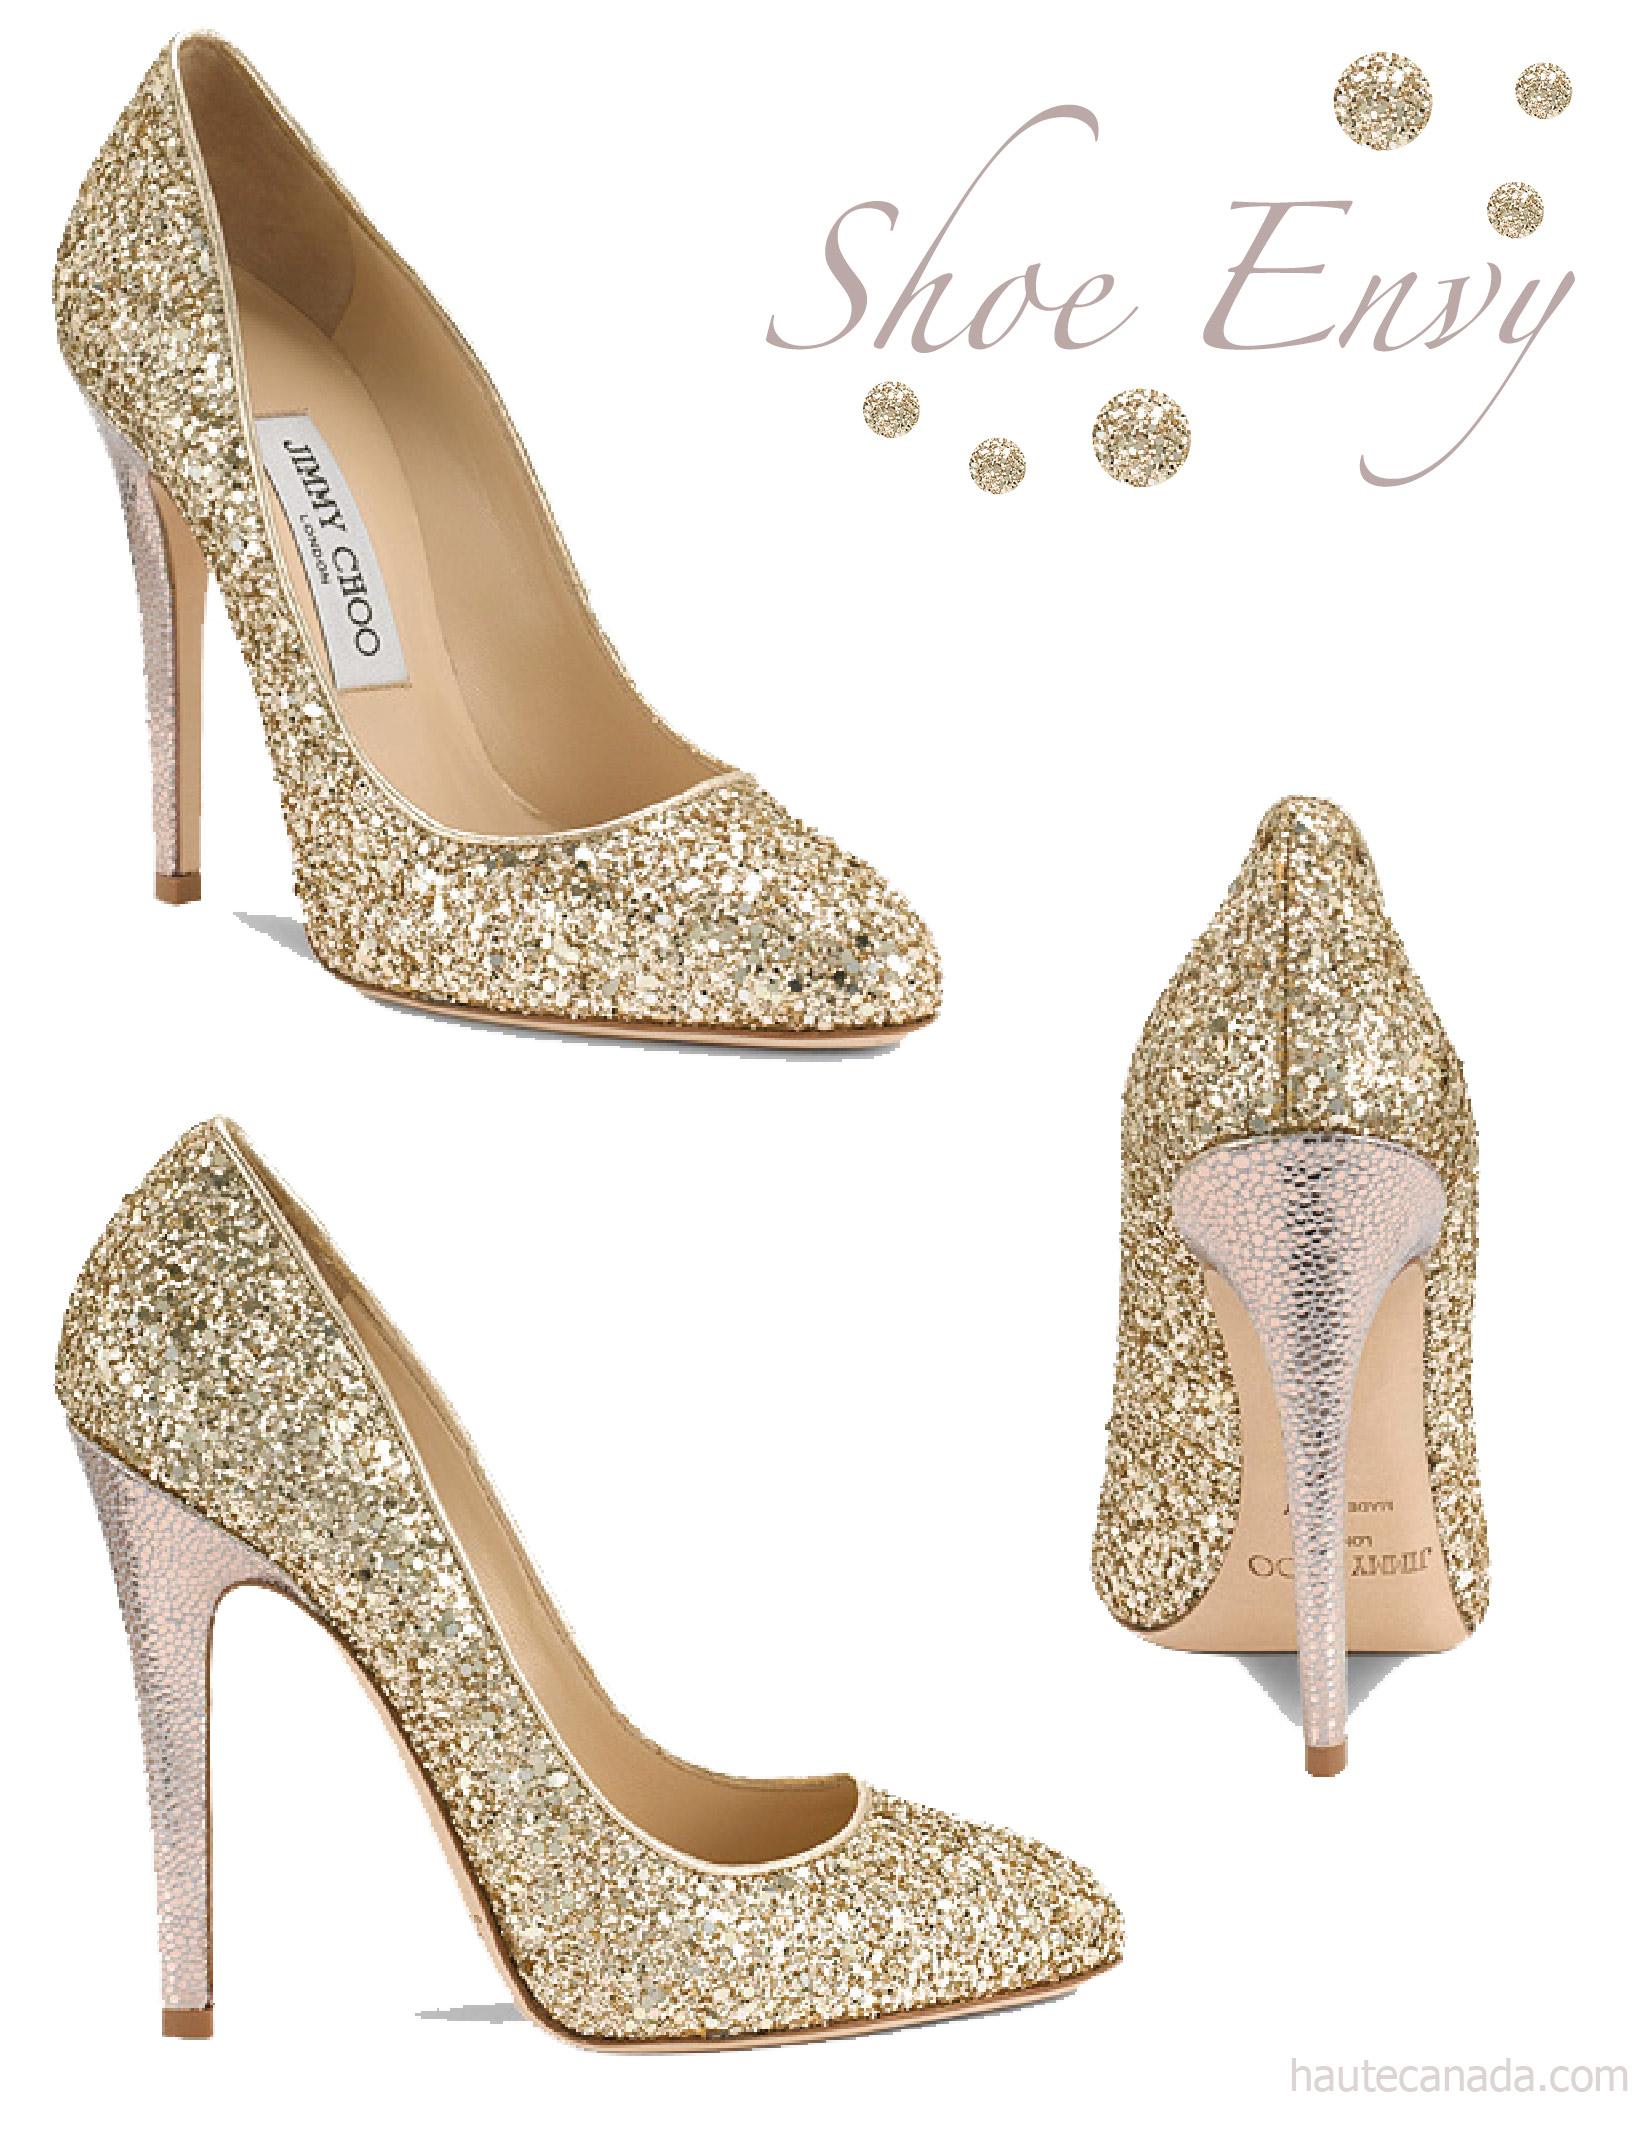 Where Can I Buy Jimmy Choo Pumps - 2013 01 15 Shoe Envy Jimmy Choo Victoria Gold Glitter Pumps